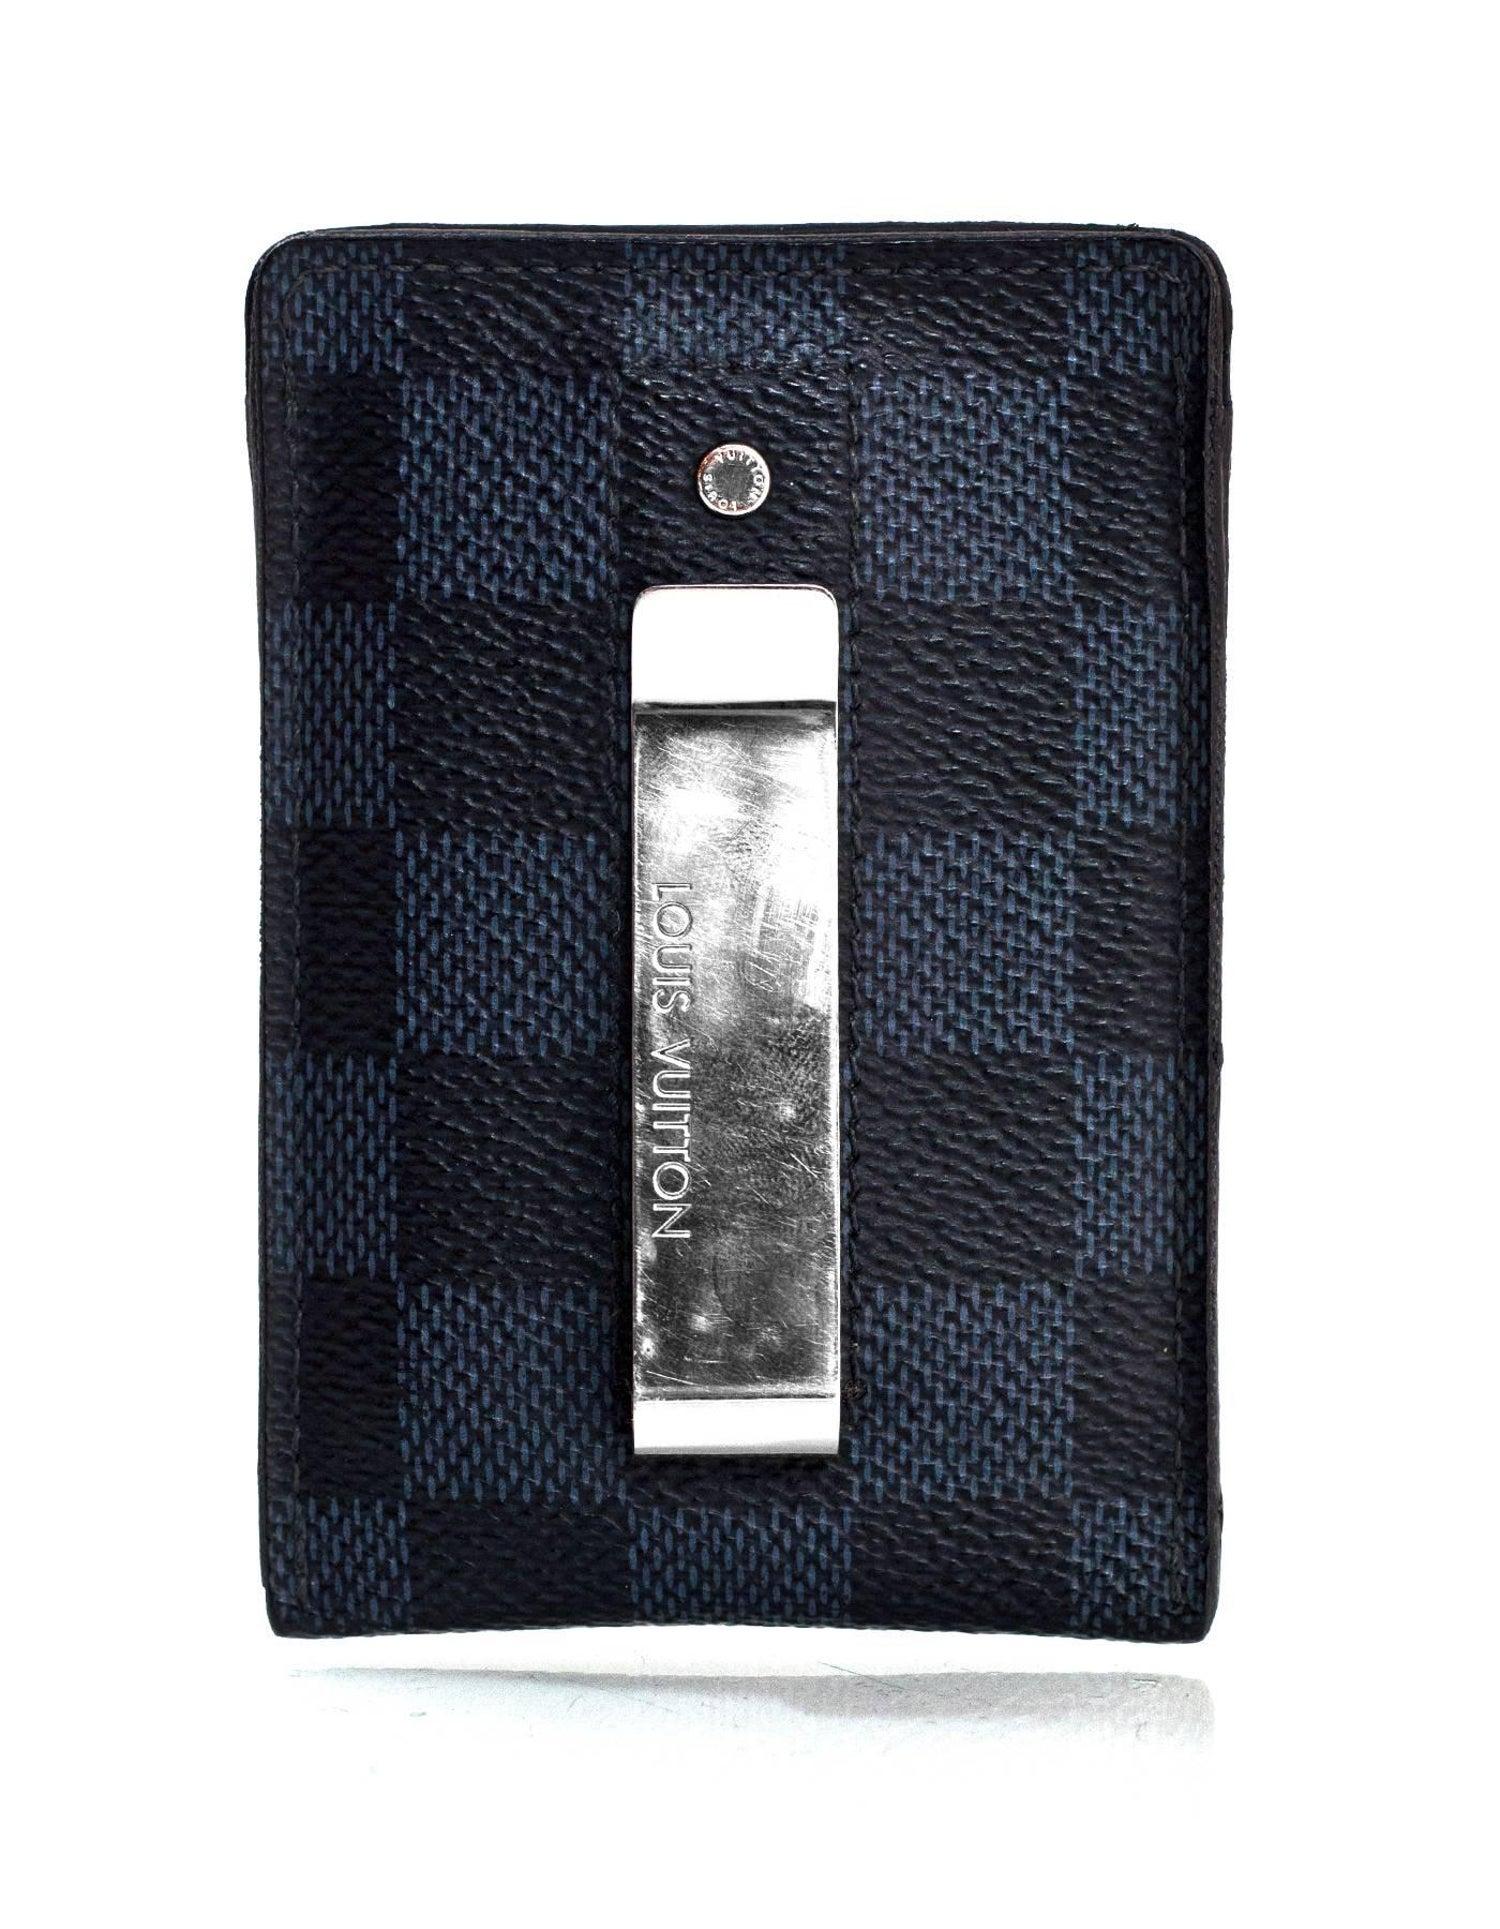 Louis Vuitton Men s Damier Cobalt Card Holder Money Clip SHW For Sale at  1stdibs 8402bb282cbb3